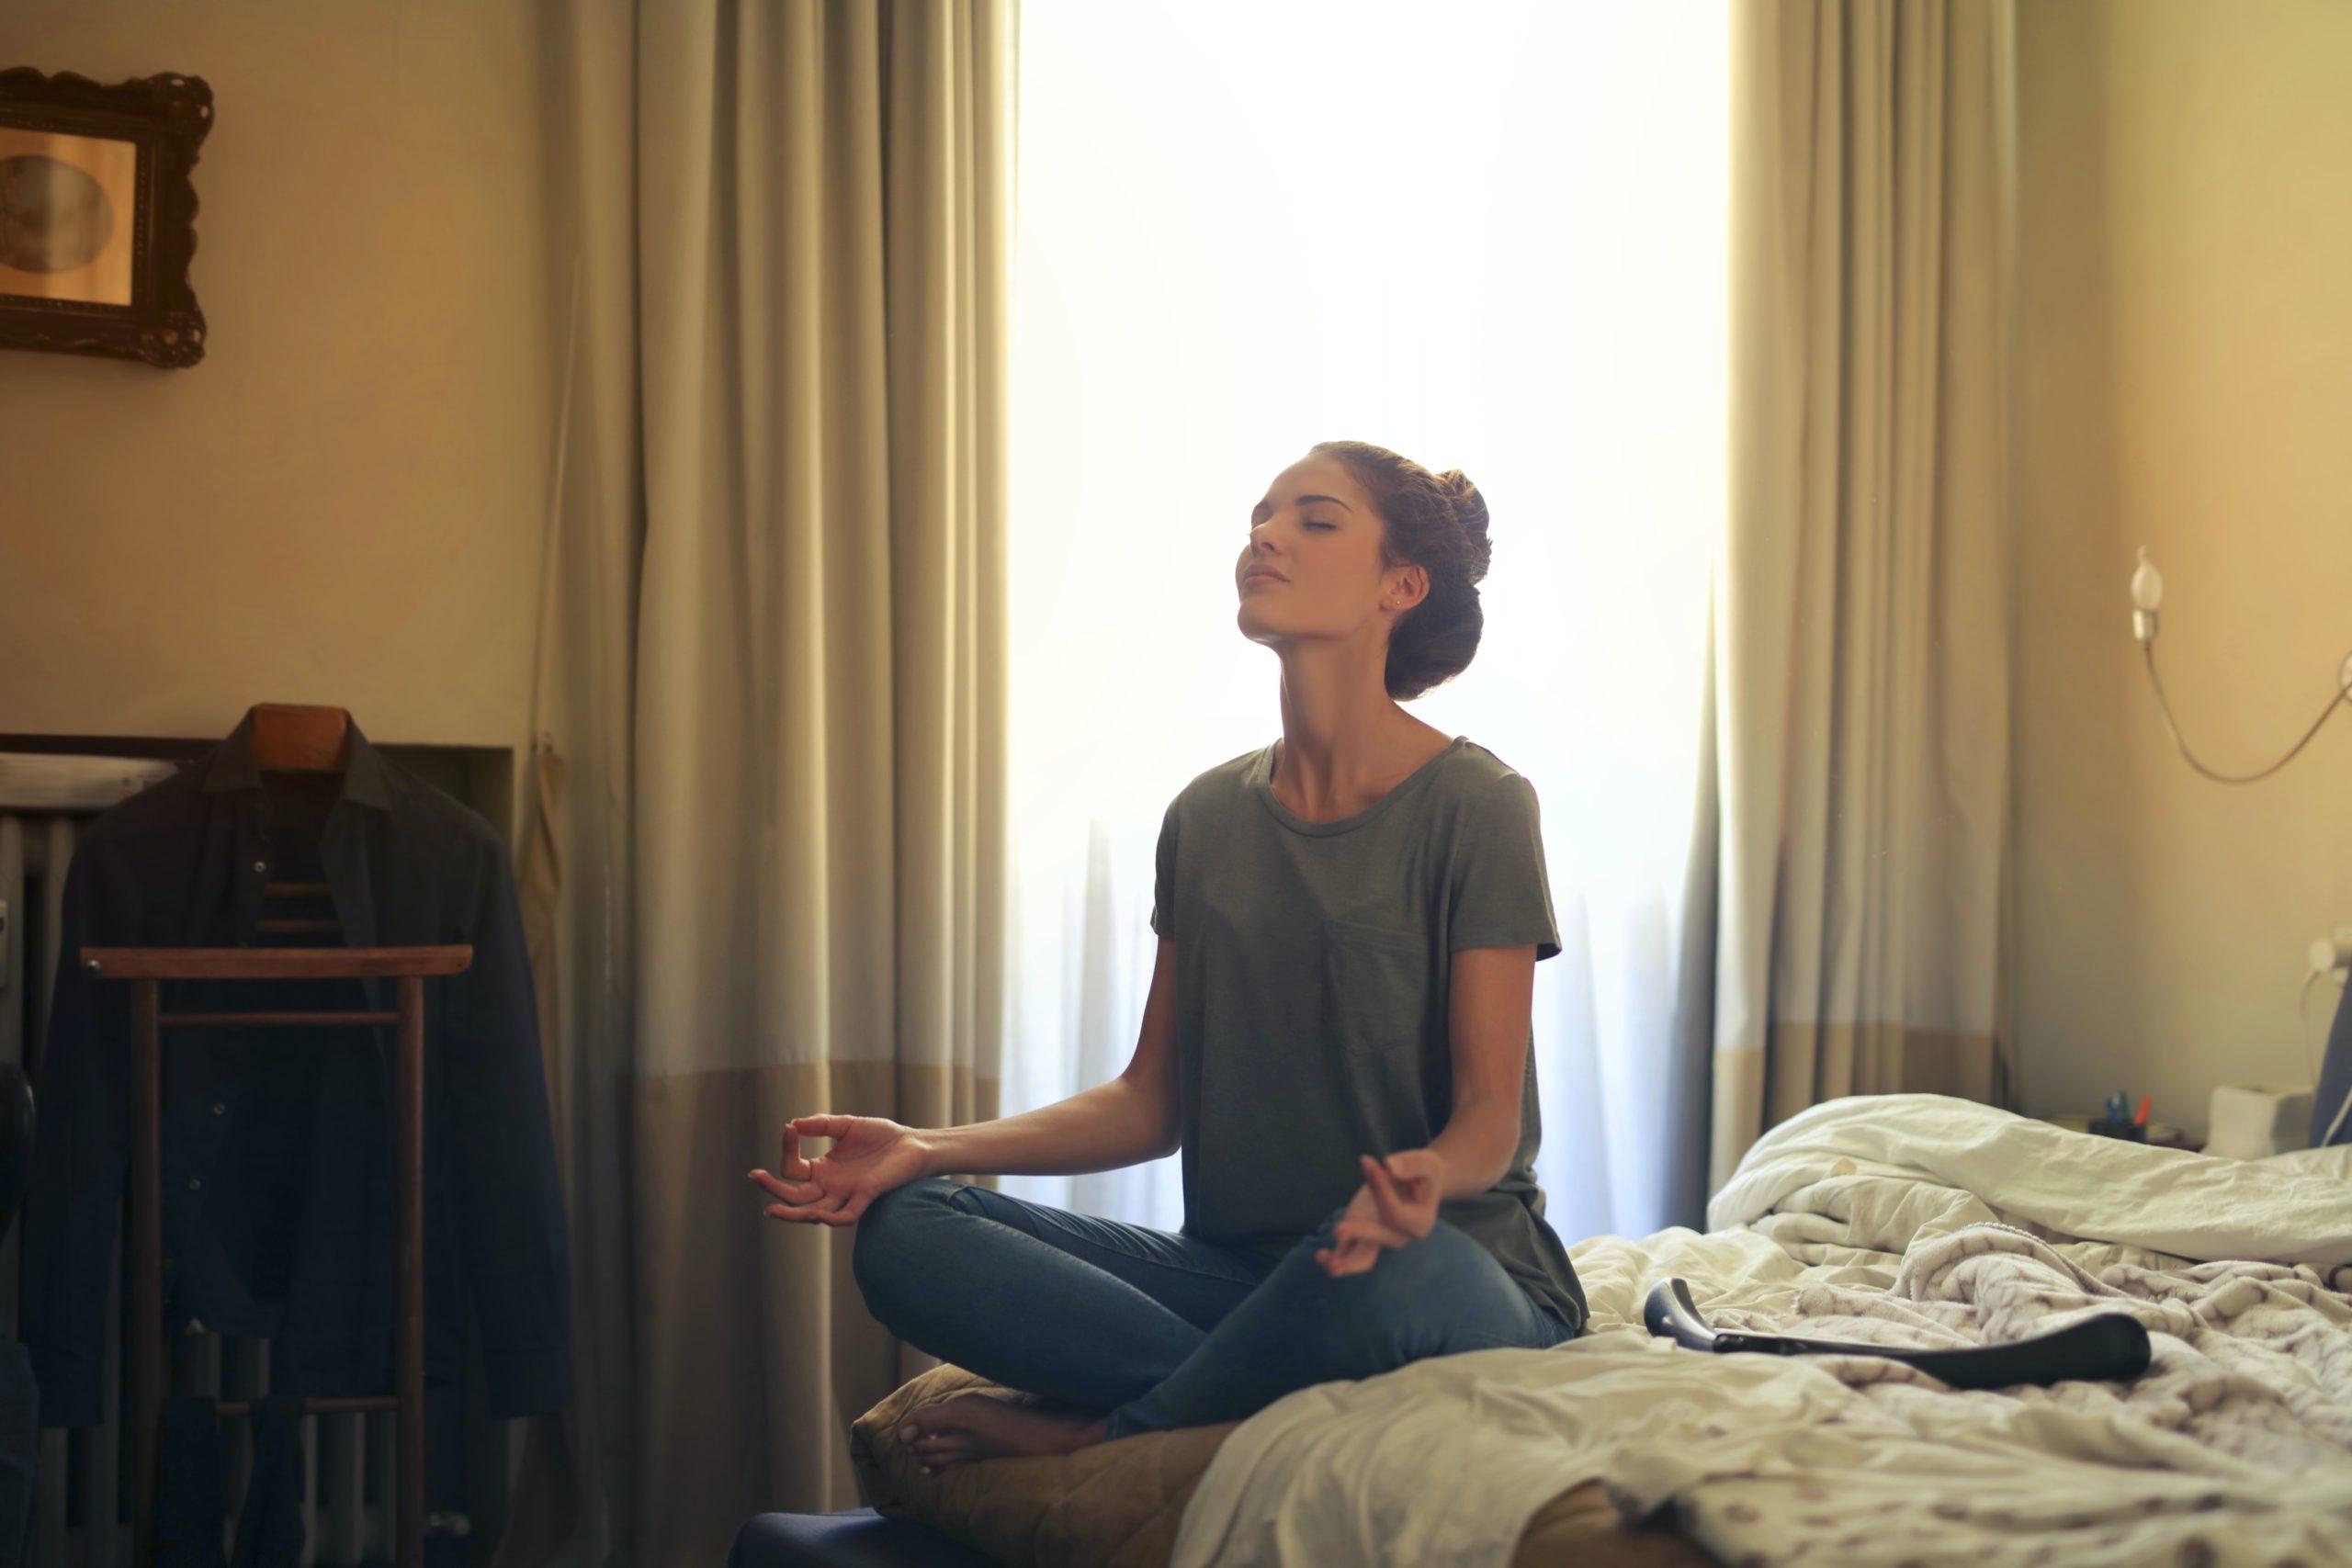 Meditation practice - mindfulness